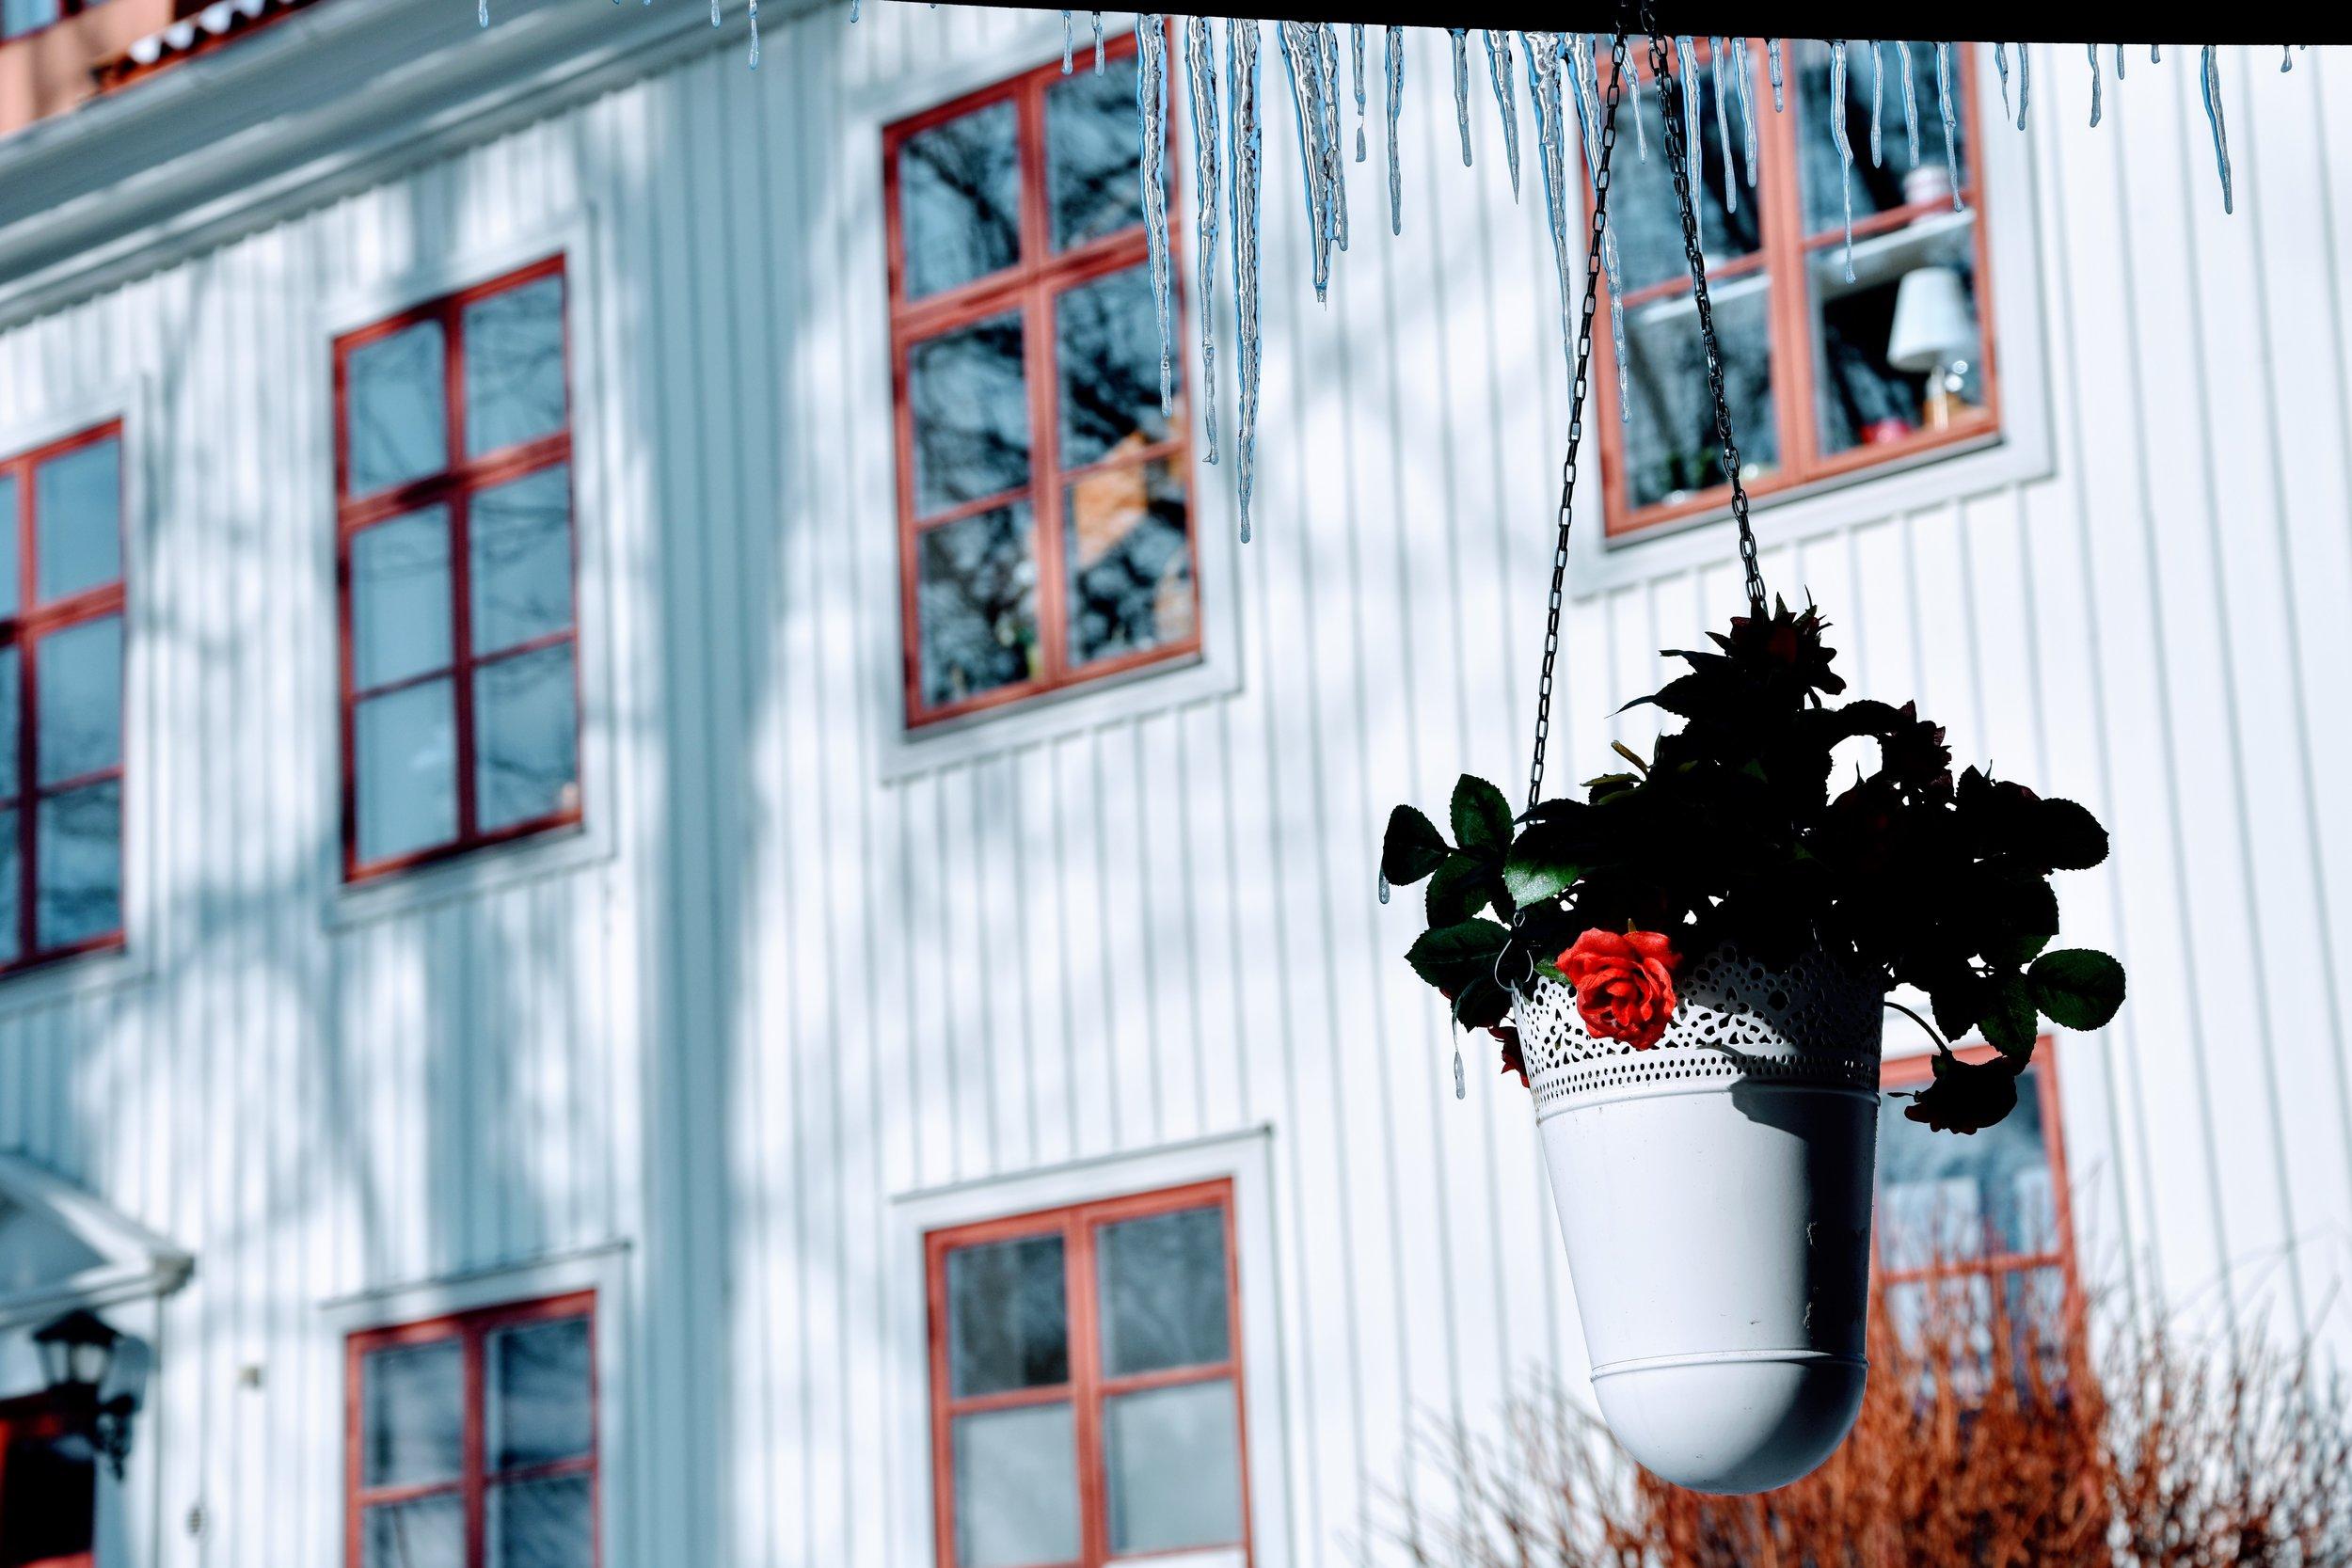 Staycation i Örebro med Sofia Brolin (hildas.se)